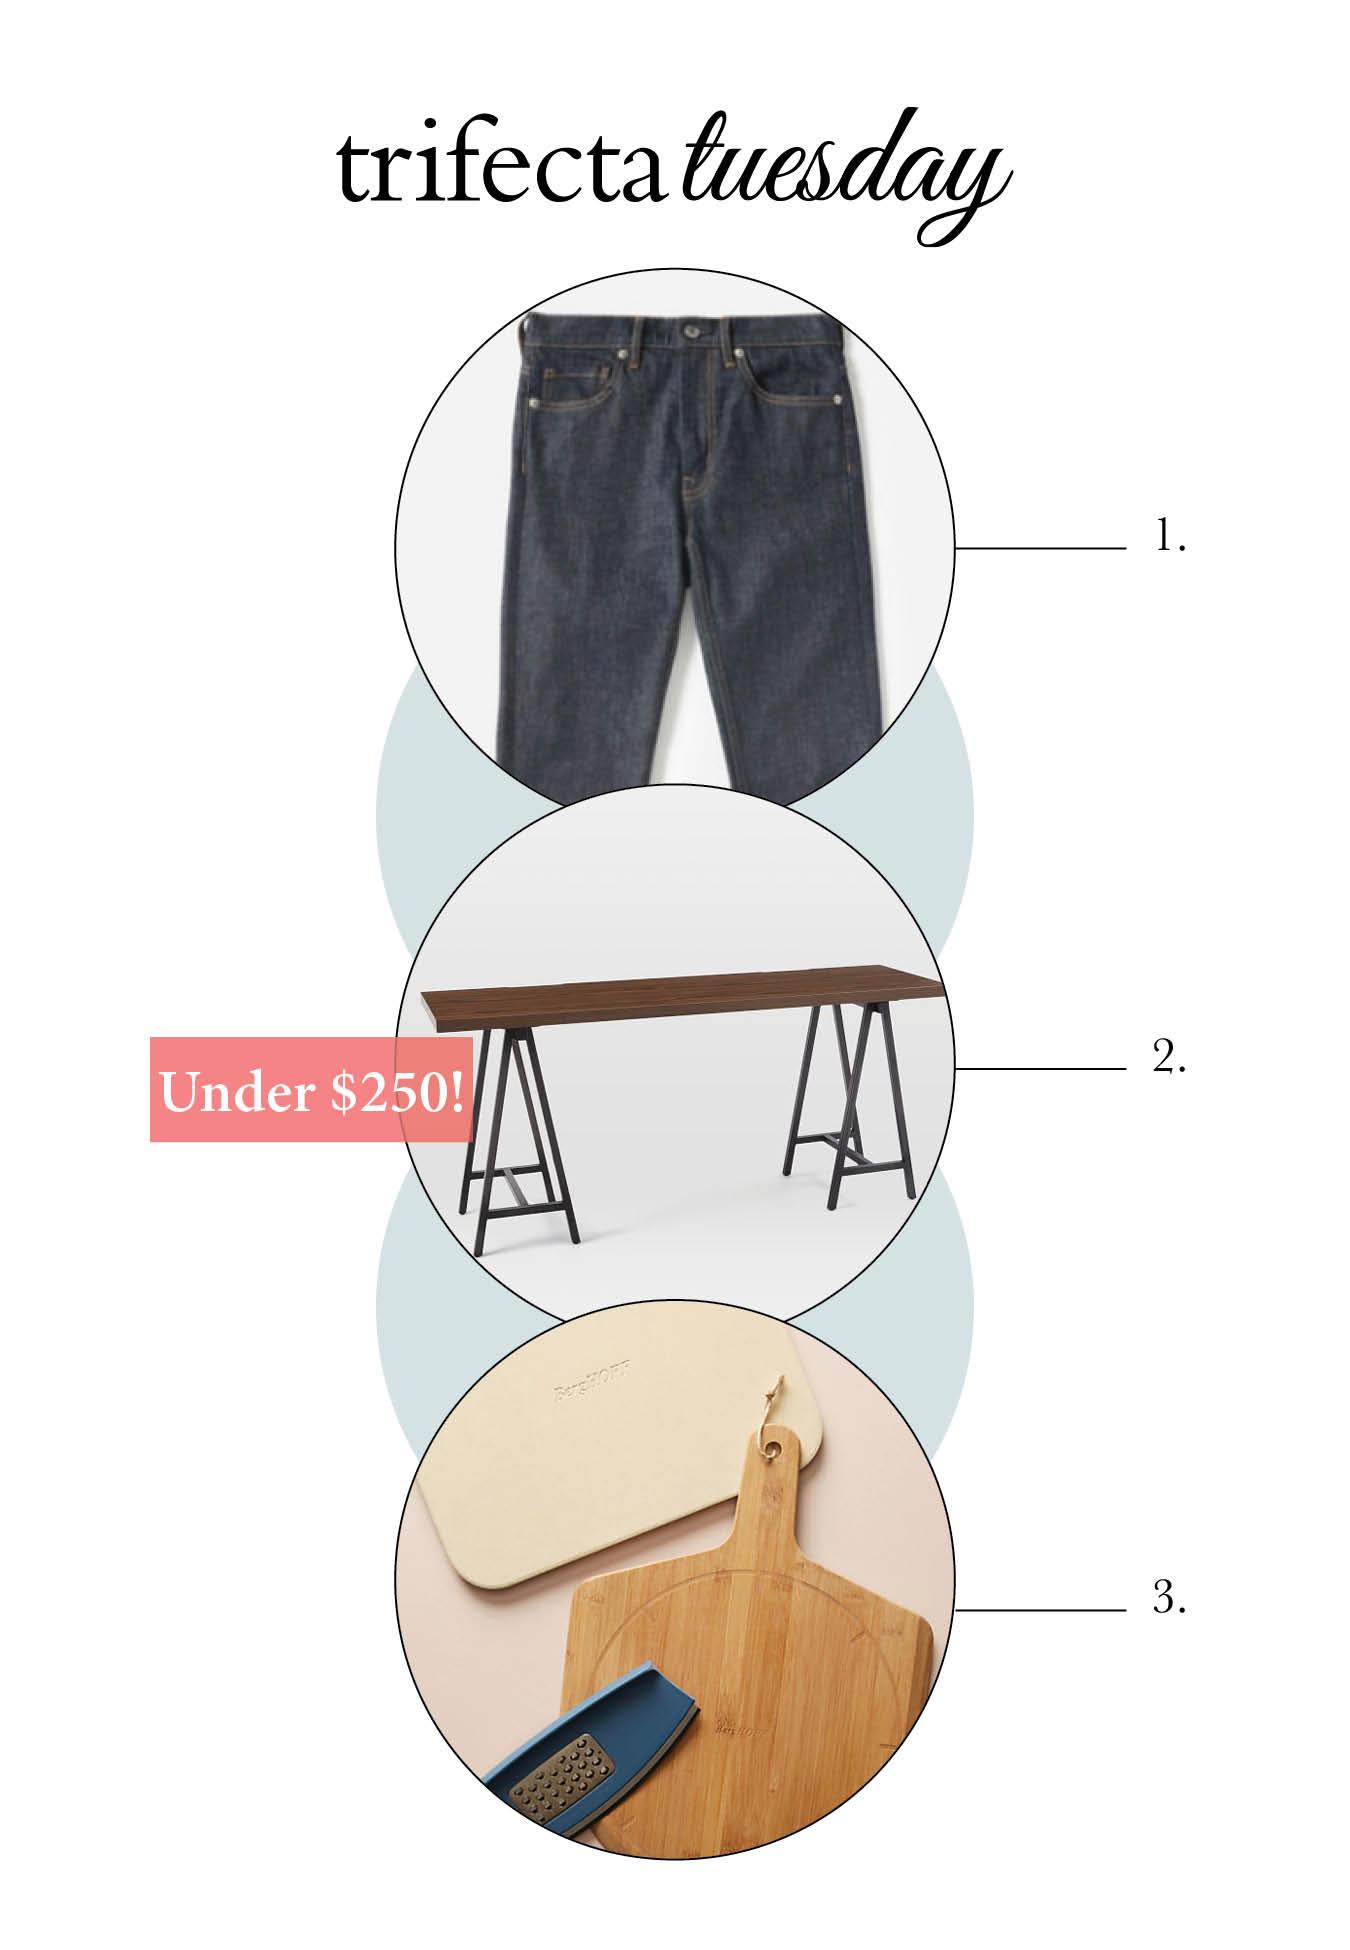 Skinny jeans, desk, pizza set